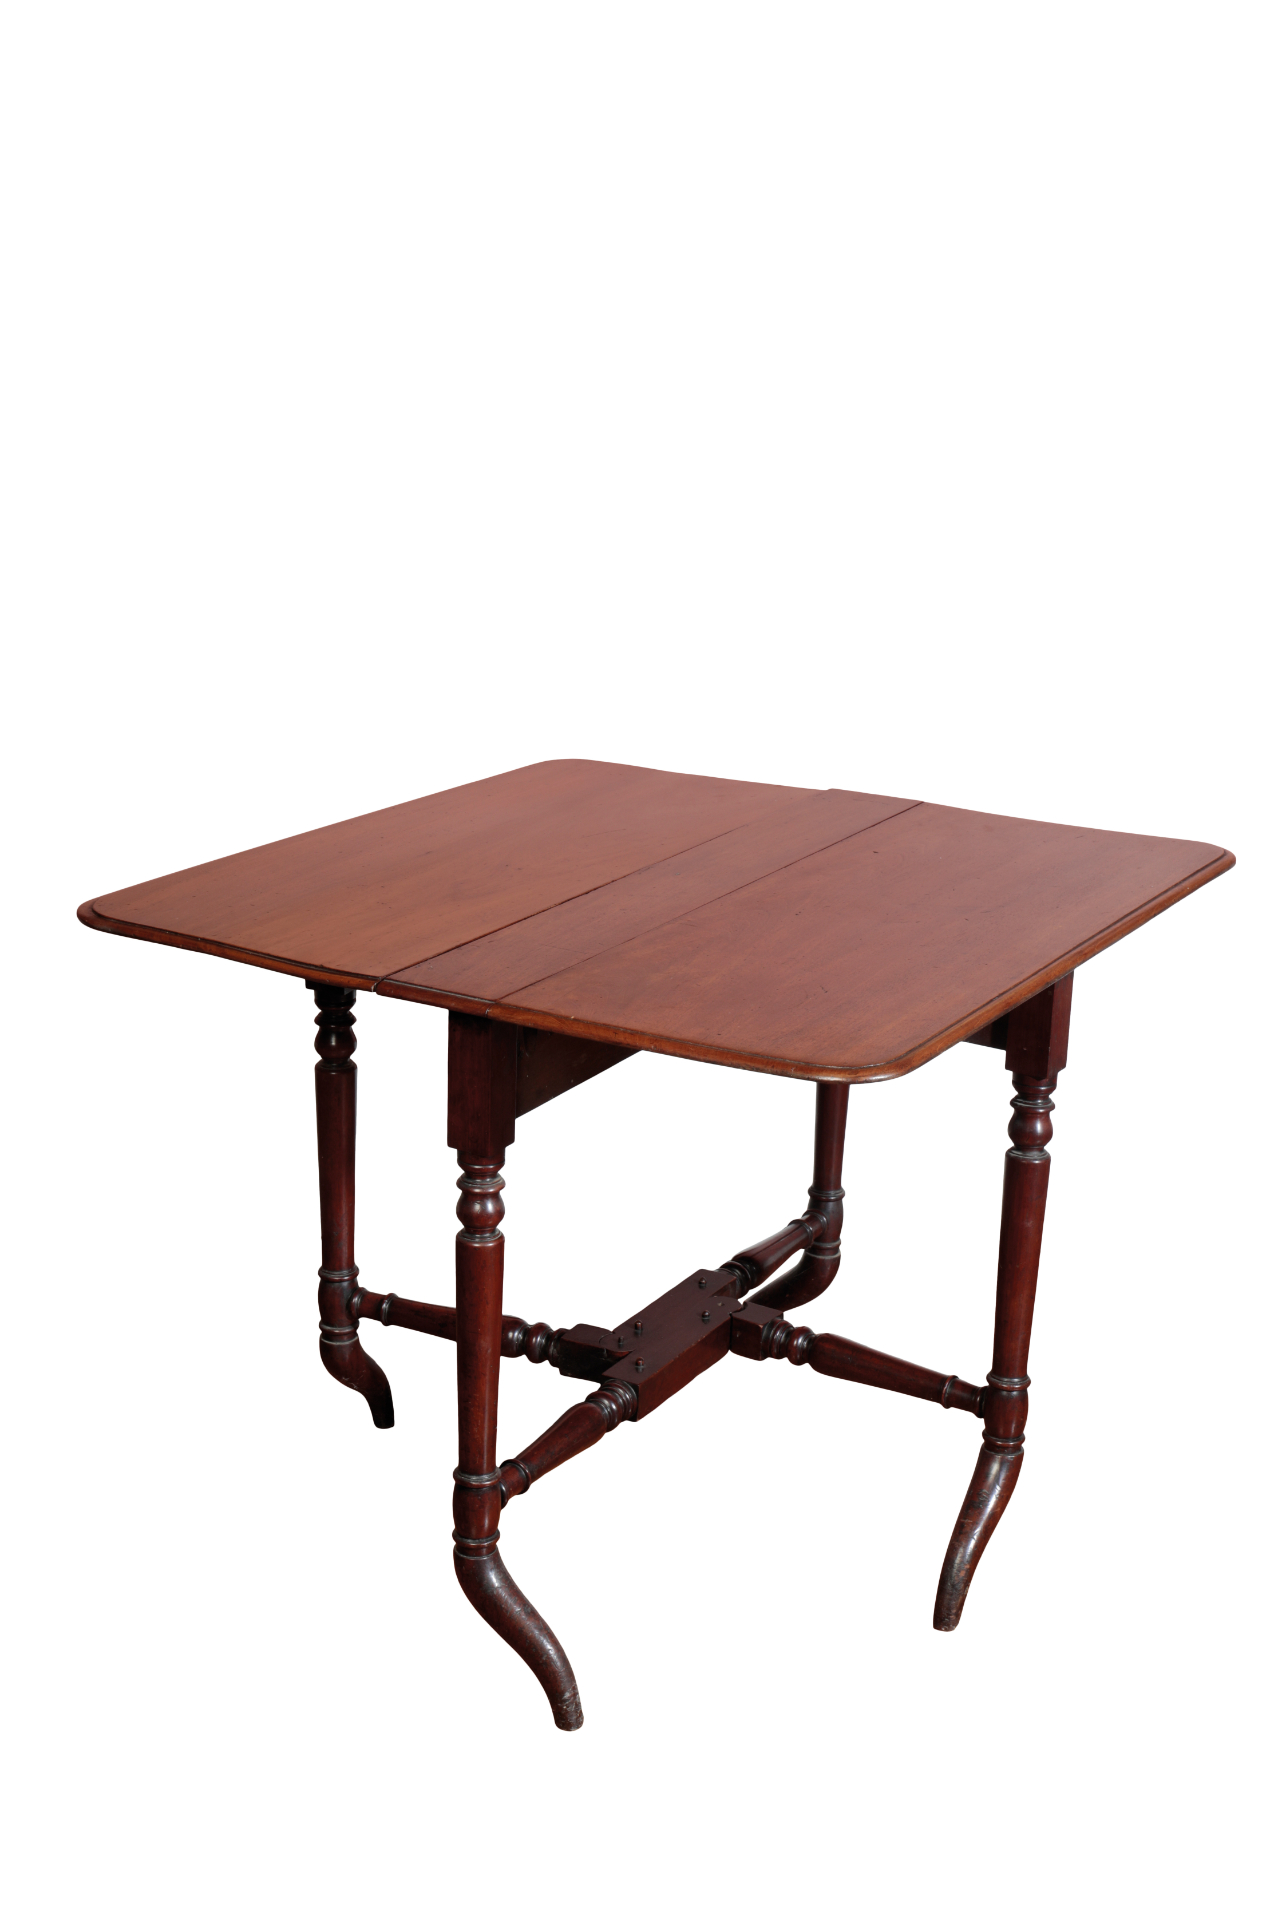 A MAHOGANY SUTHERLAND TABLE, - Image 3 of 3